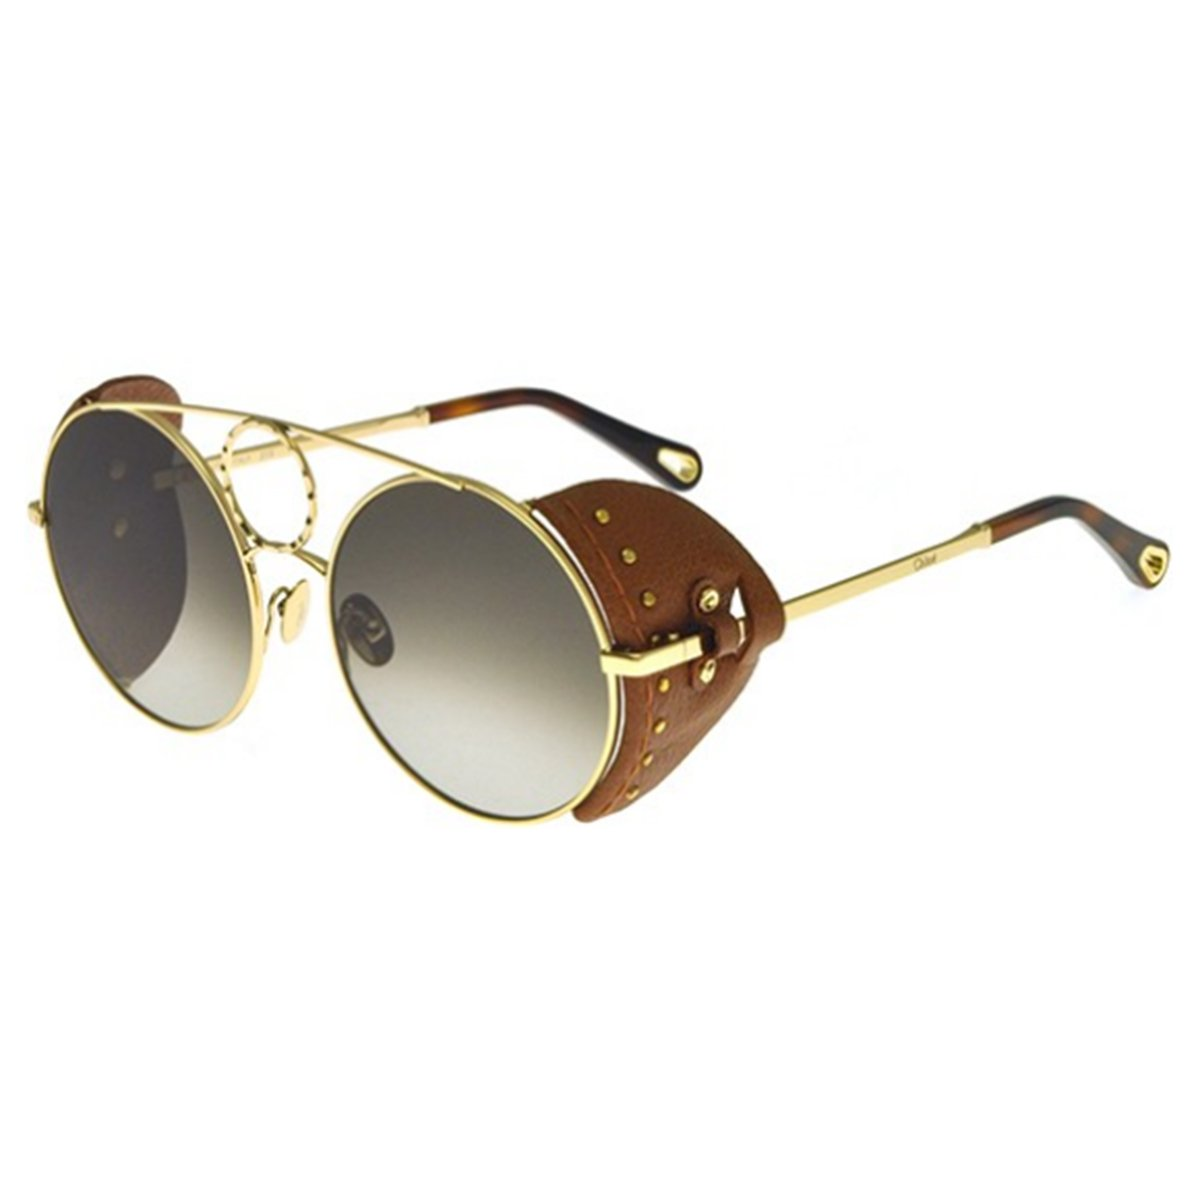 65b928ecd Compre Óculos de Sol Chloé Sierra em 10X | Tri-Jóia Shop